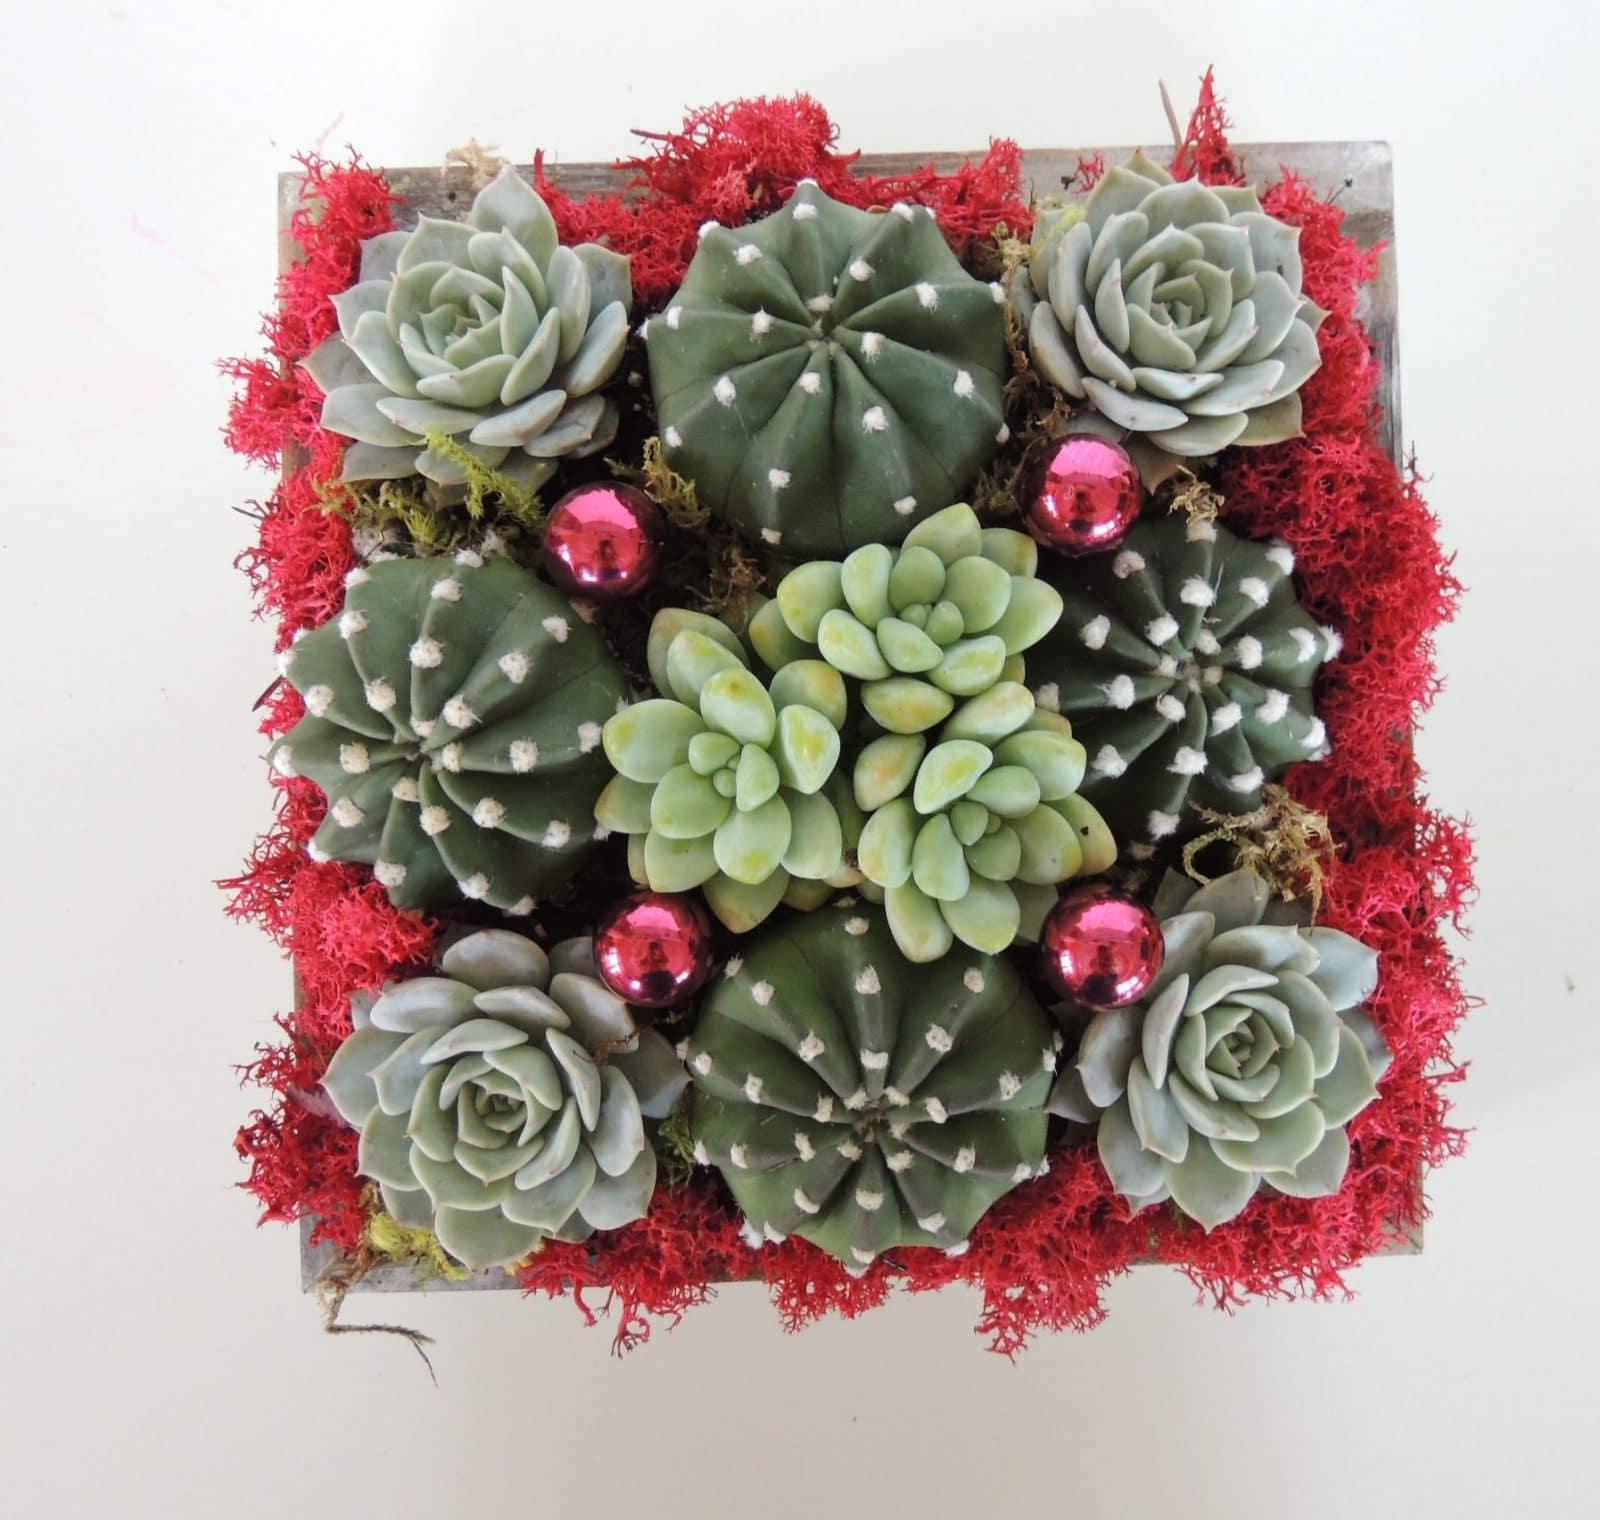 Christmas Succulent Gift.Cactus And Echeverias Arrangement